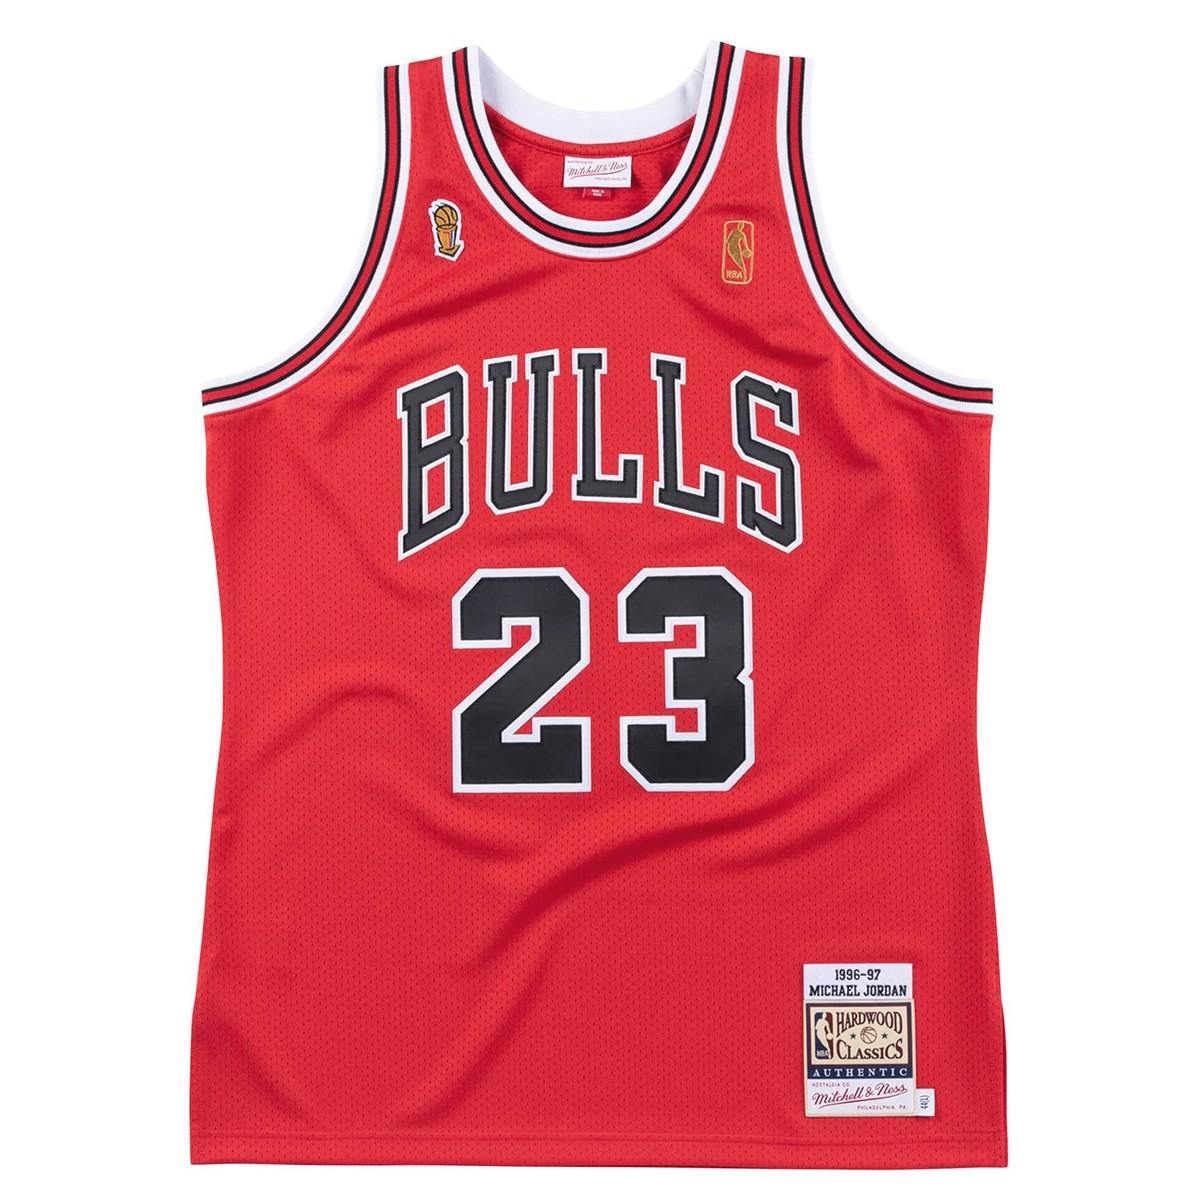 Mitchell & Ness Jordan Authentic Jersey 'Finals 96-97'